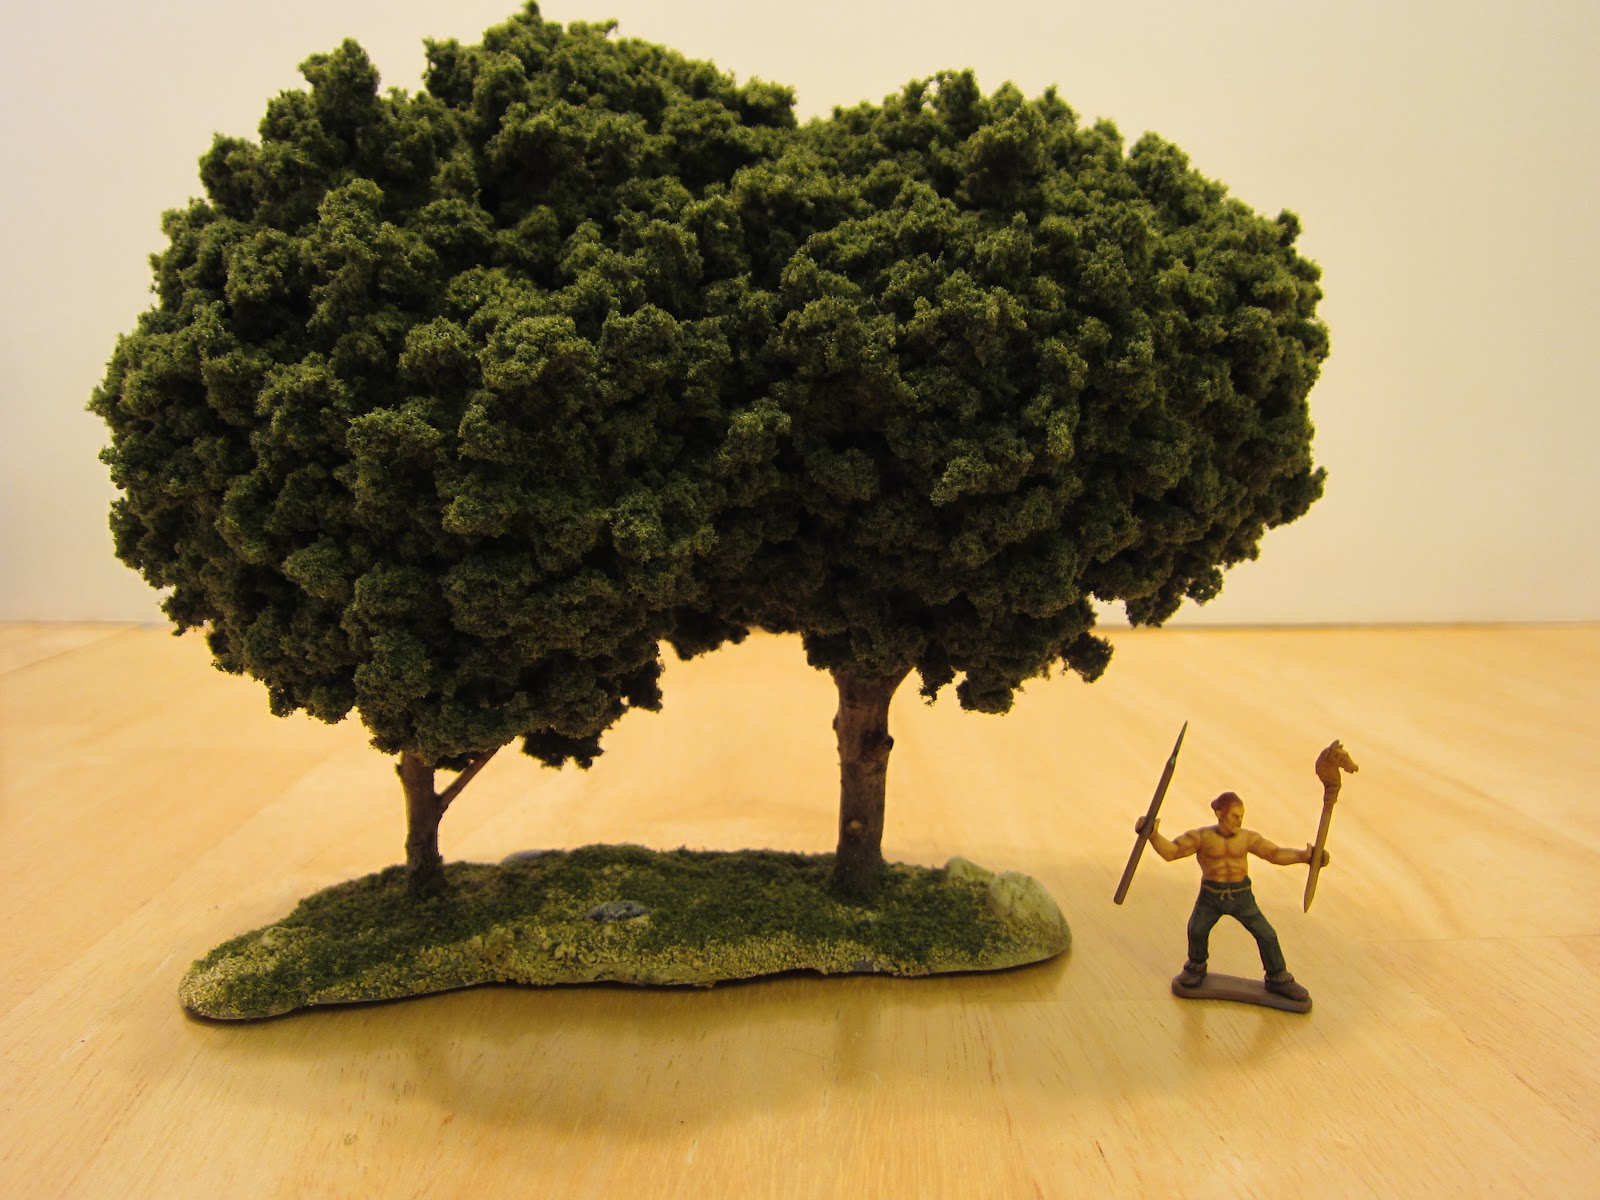 1000 Foot General: Improving My Miniature Terrain Trees